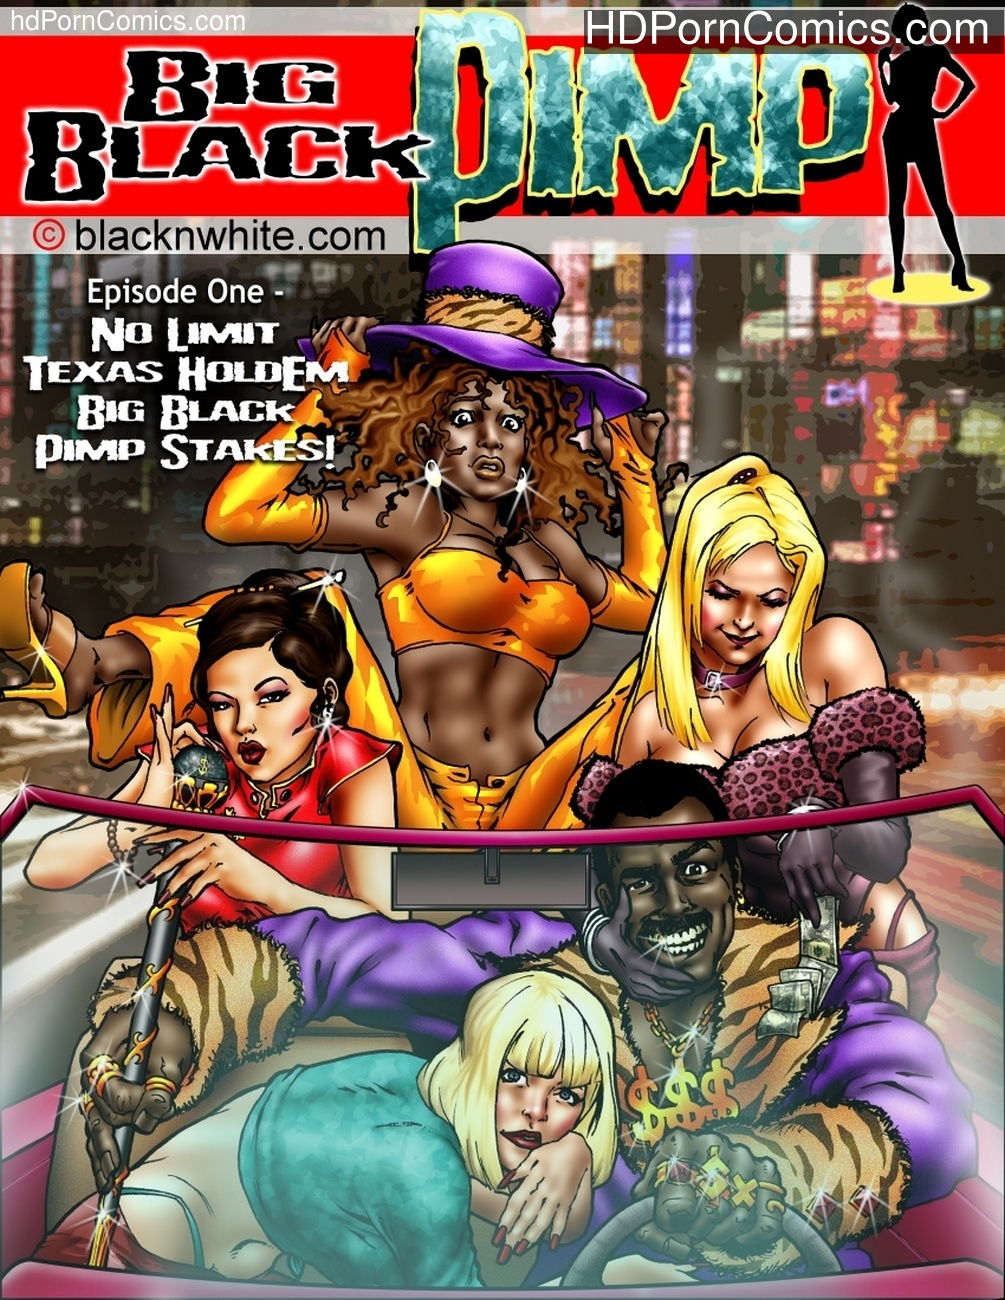 Black pimp interracial sex